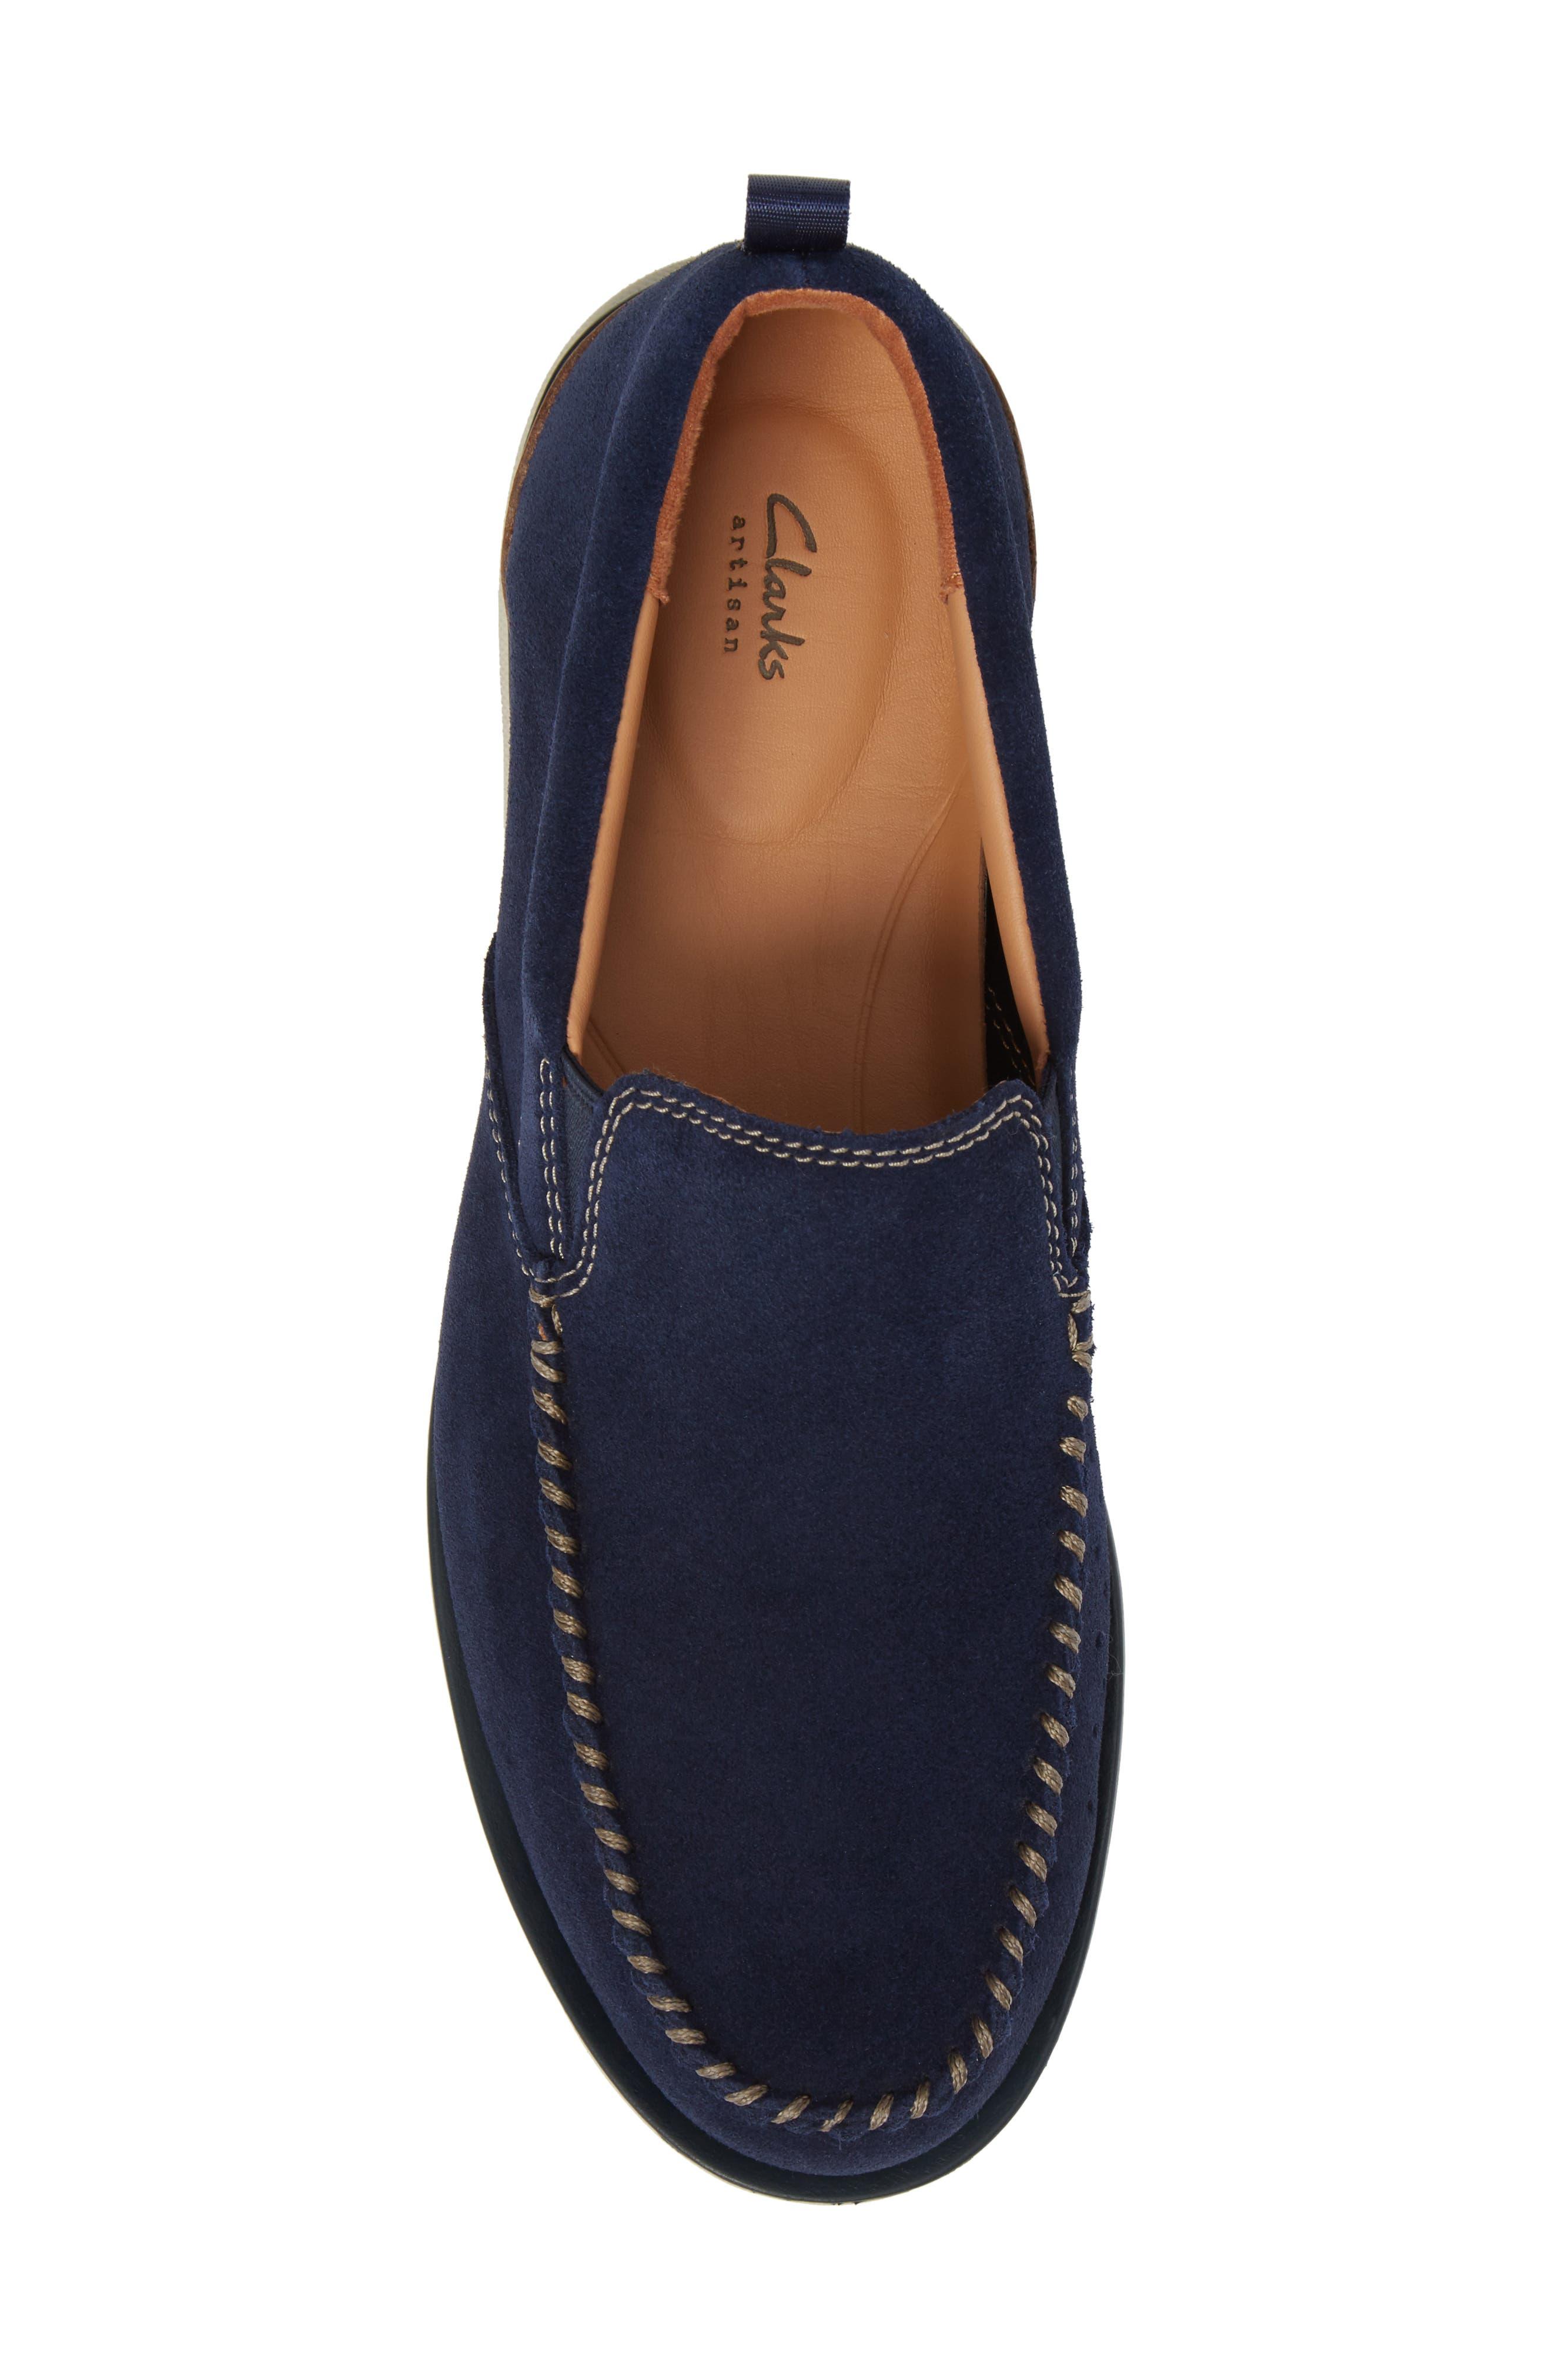 Edgewood Step Moc Toe Loafer,                             Alternate thumbnail 5, color,                             Blue Suede